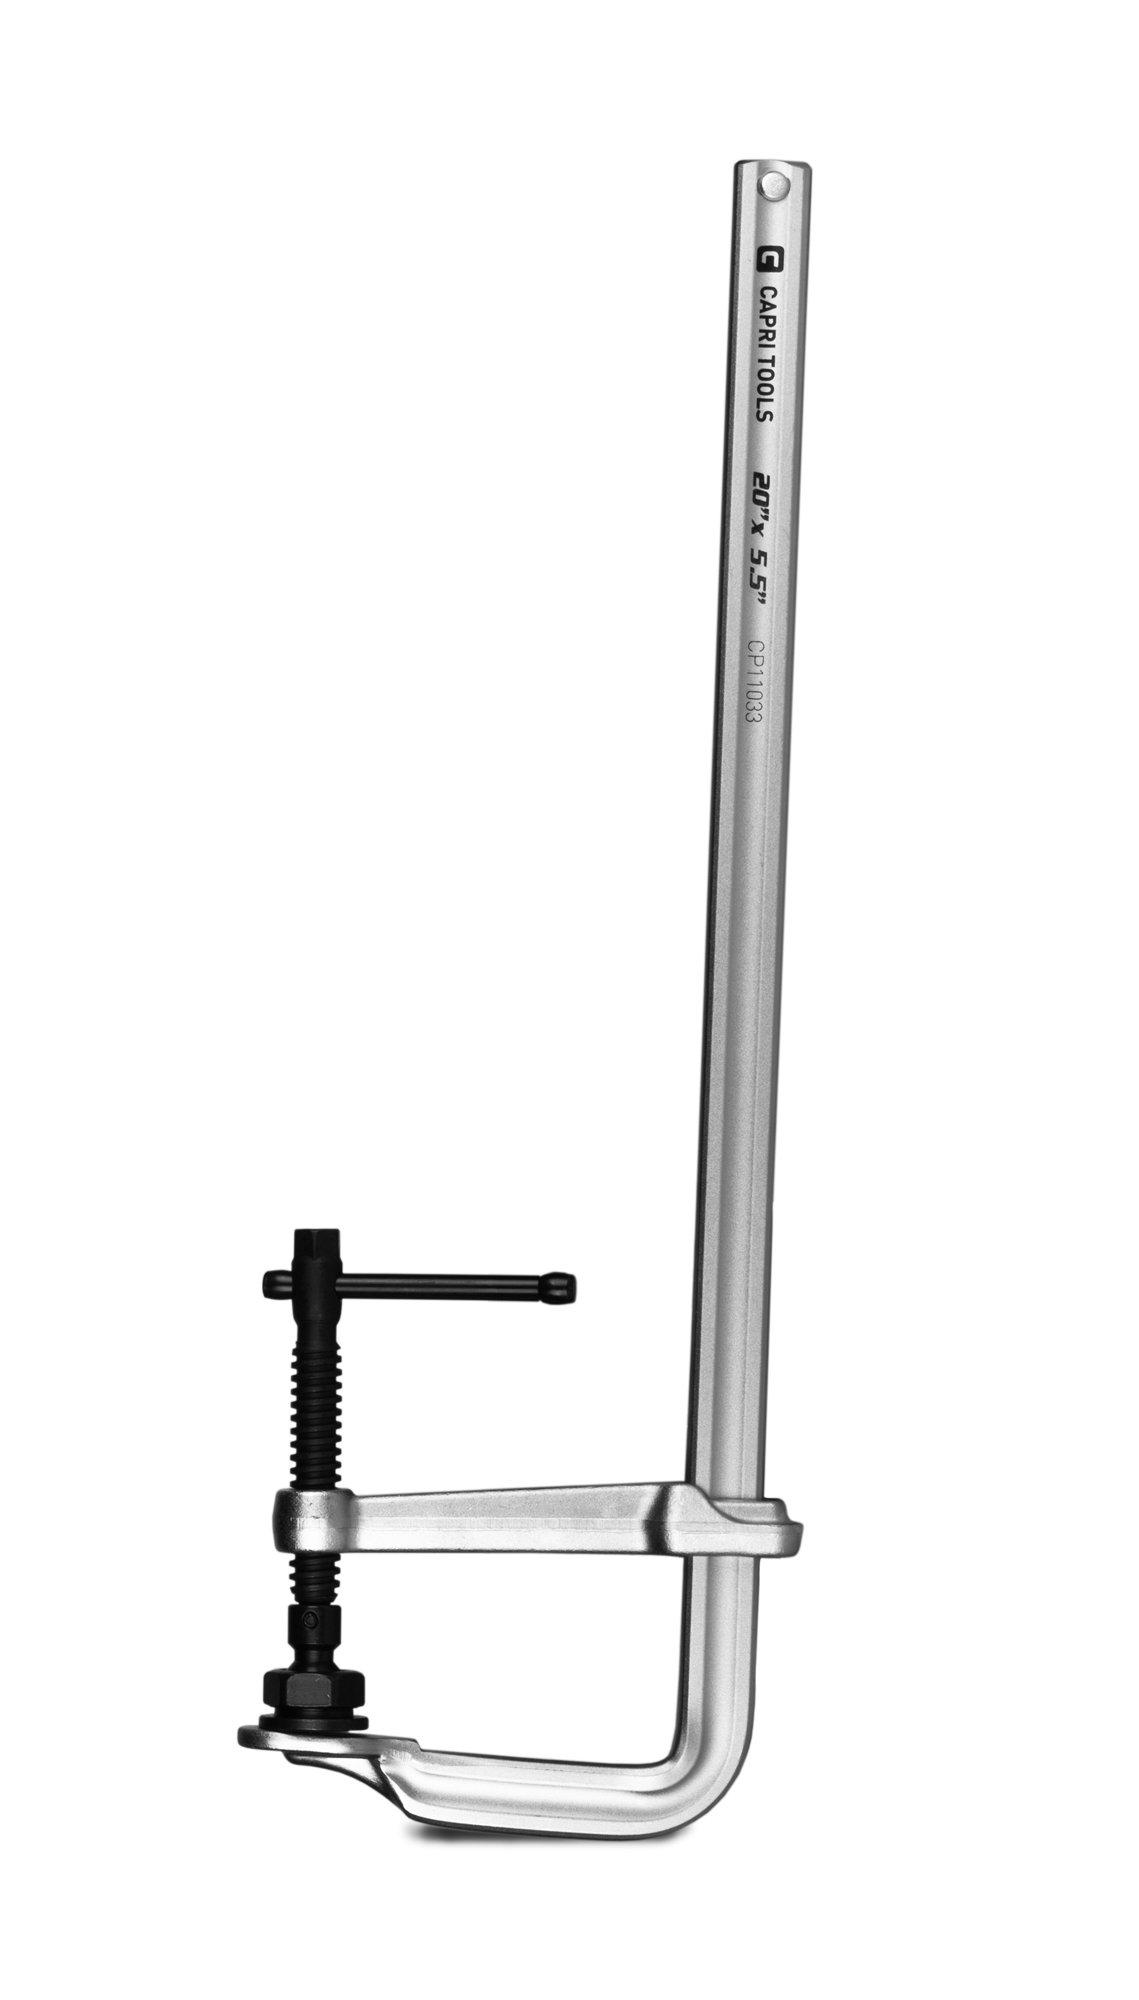 Capri Tools 20-Inch Heavy Duty All Steel Bar Clamp, 5-1/2-Inch Throat Depth, 2,645 lb Clamping Force by Capri Tools